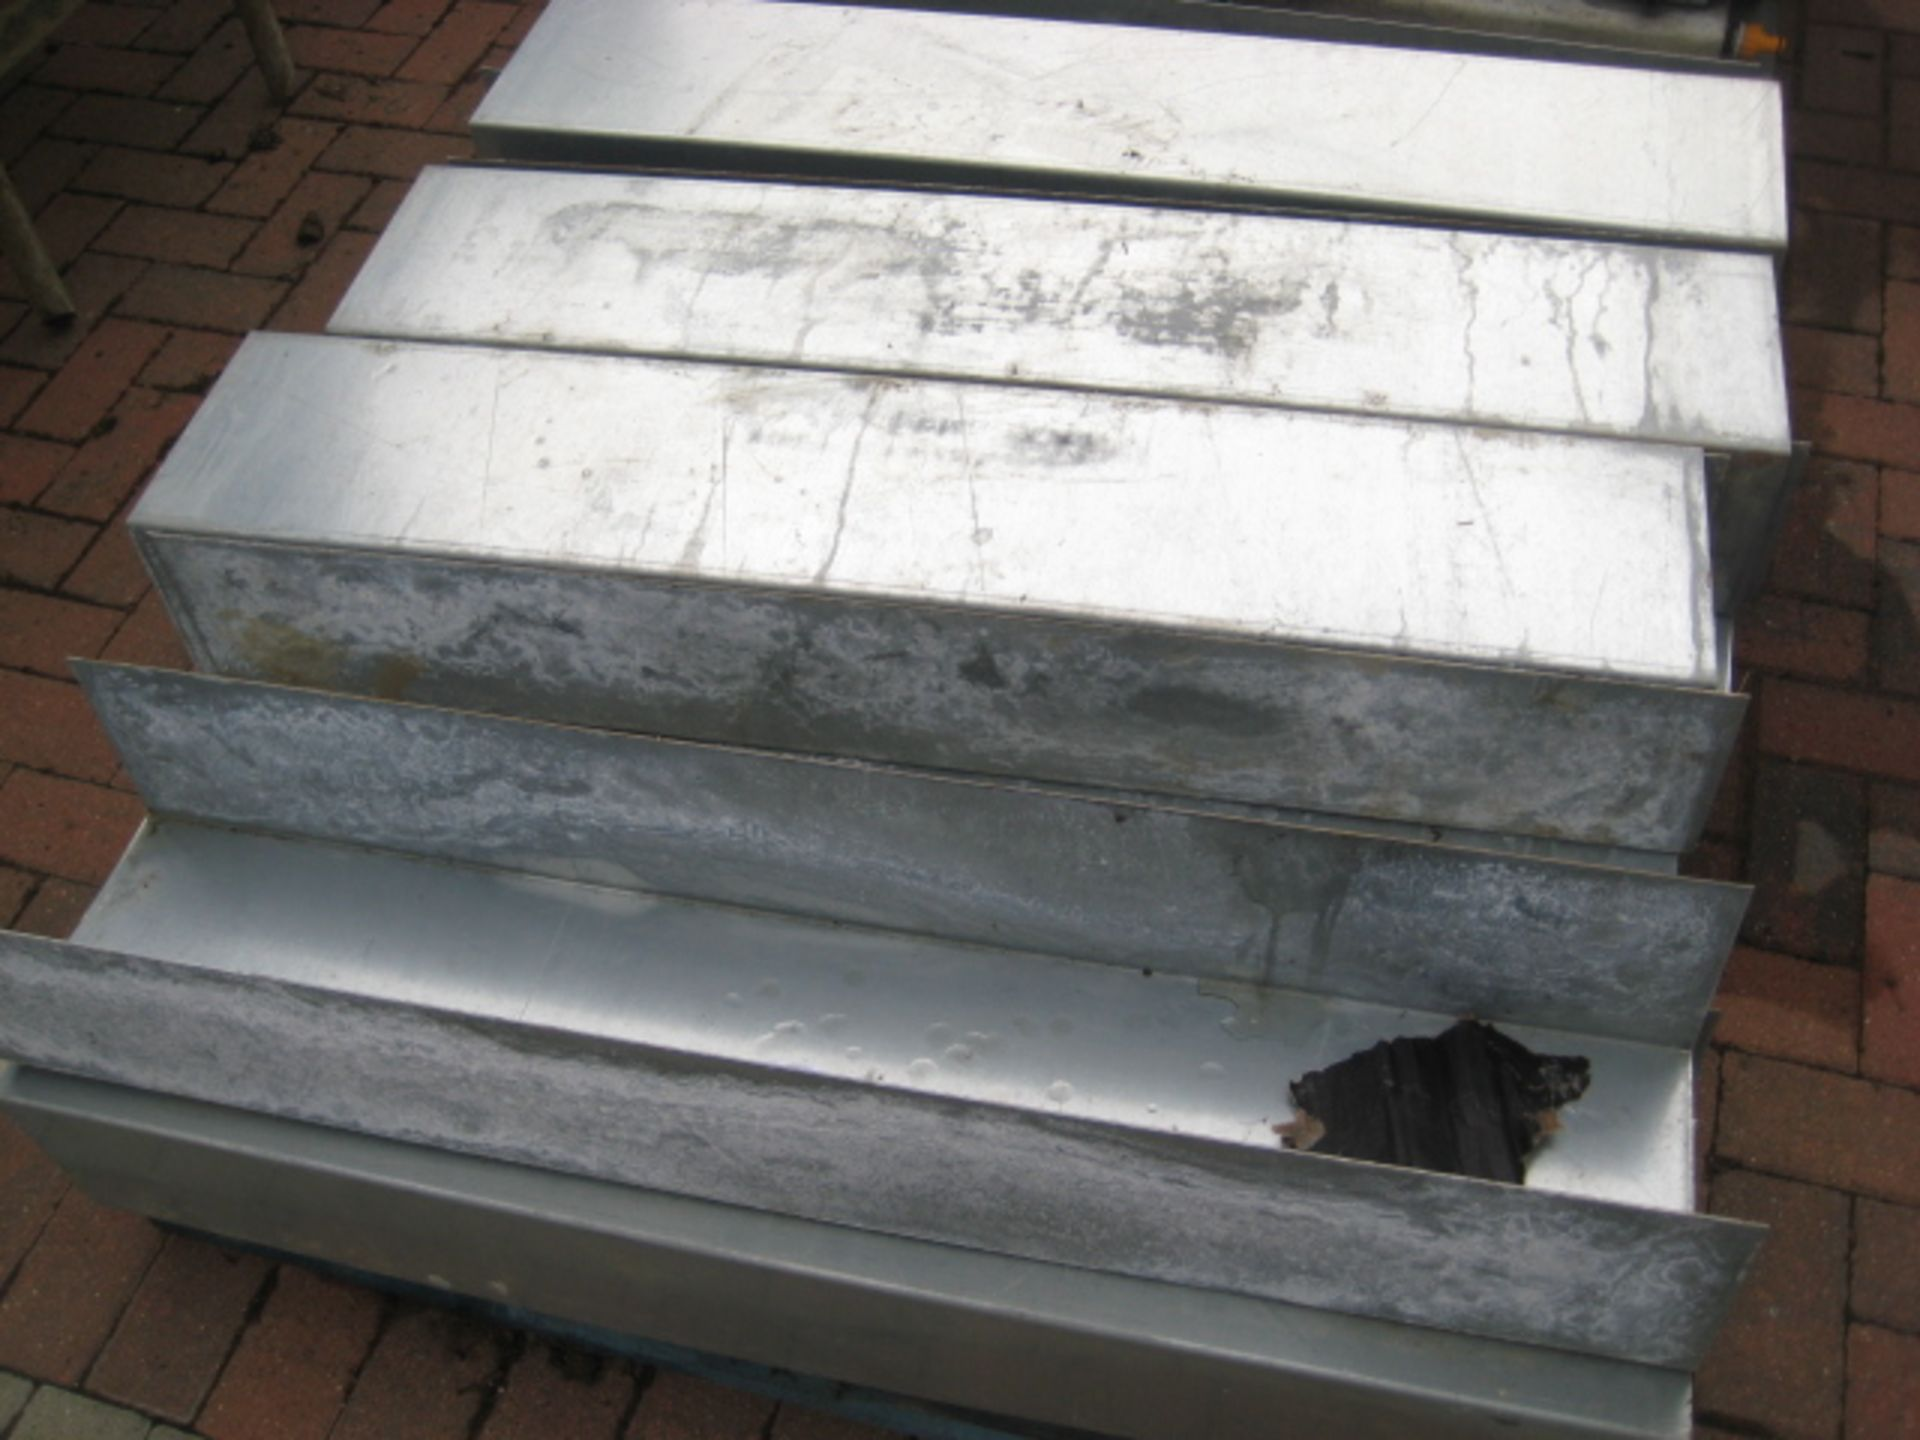 Lot 4136 - Pallet of galvanized steel troughs/conduit